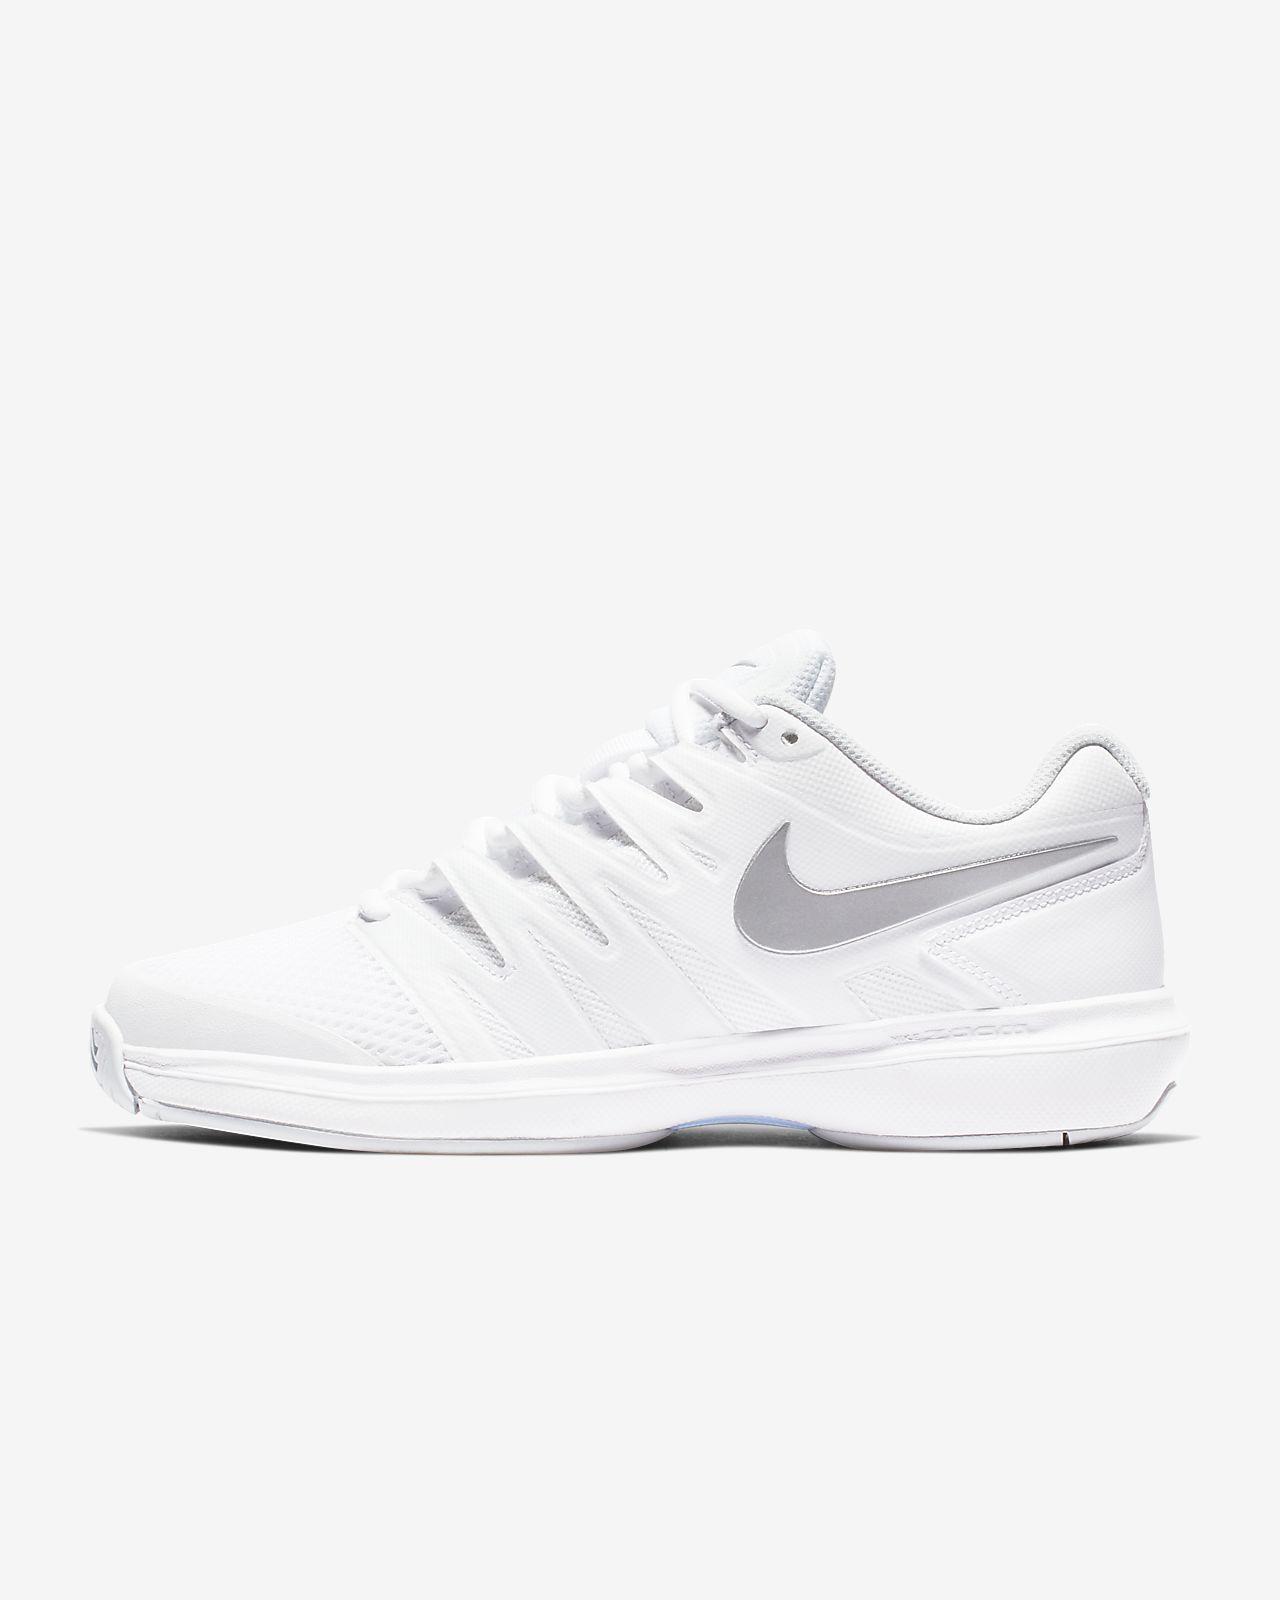 NikeCourt Air Zoom Prestige tennissko til hard court til dame